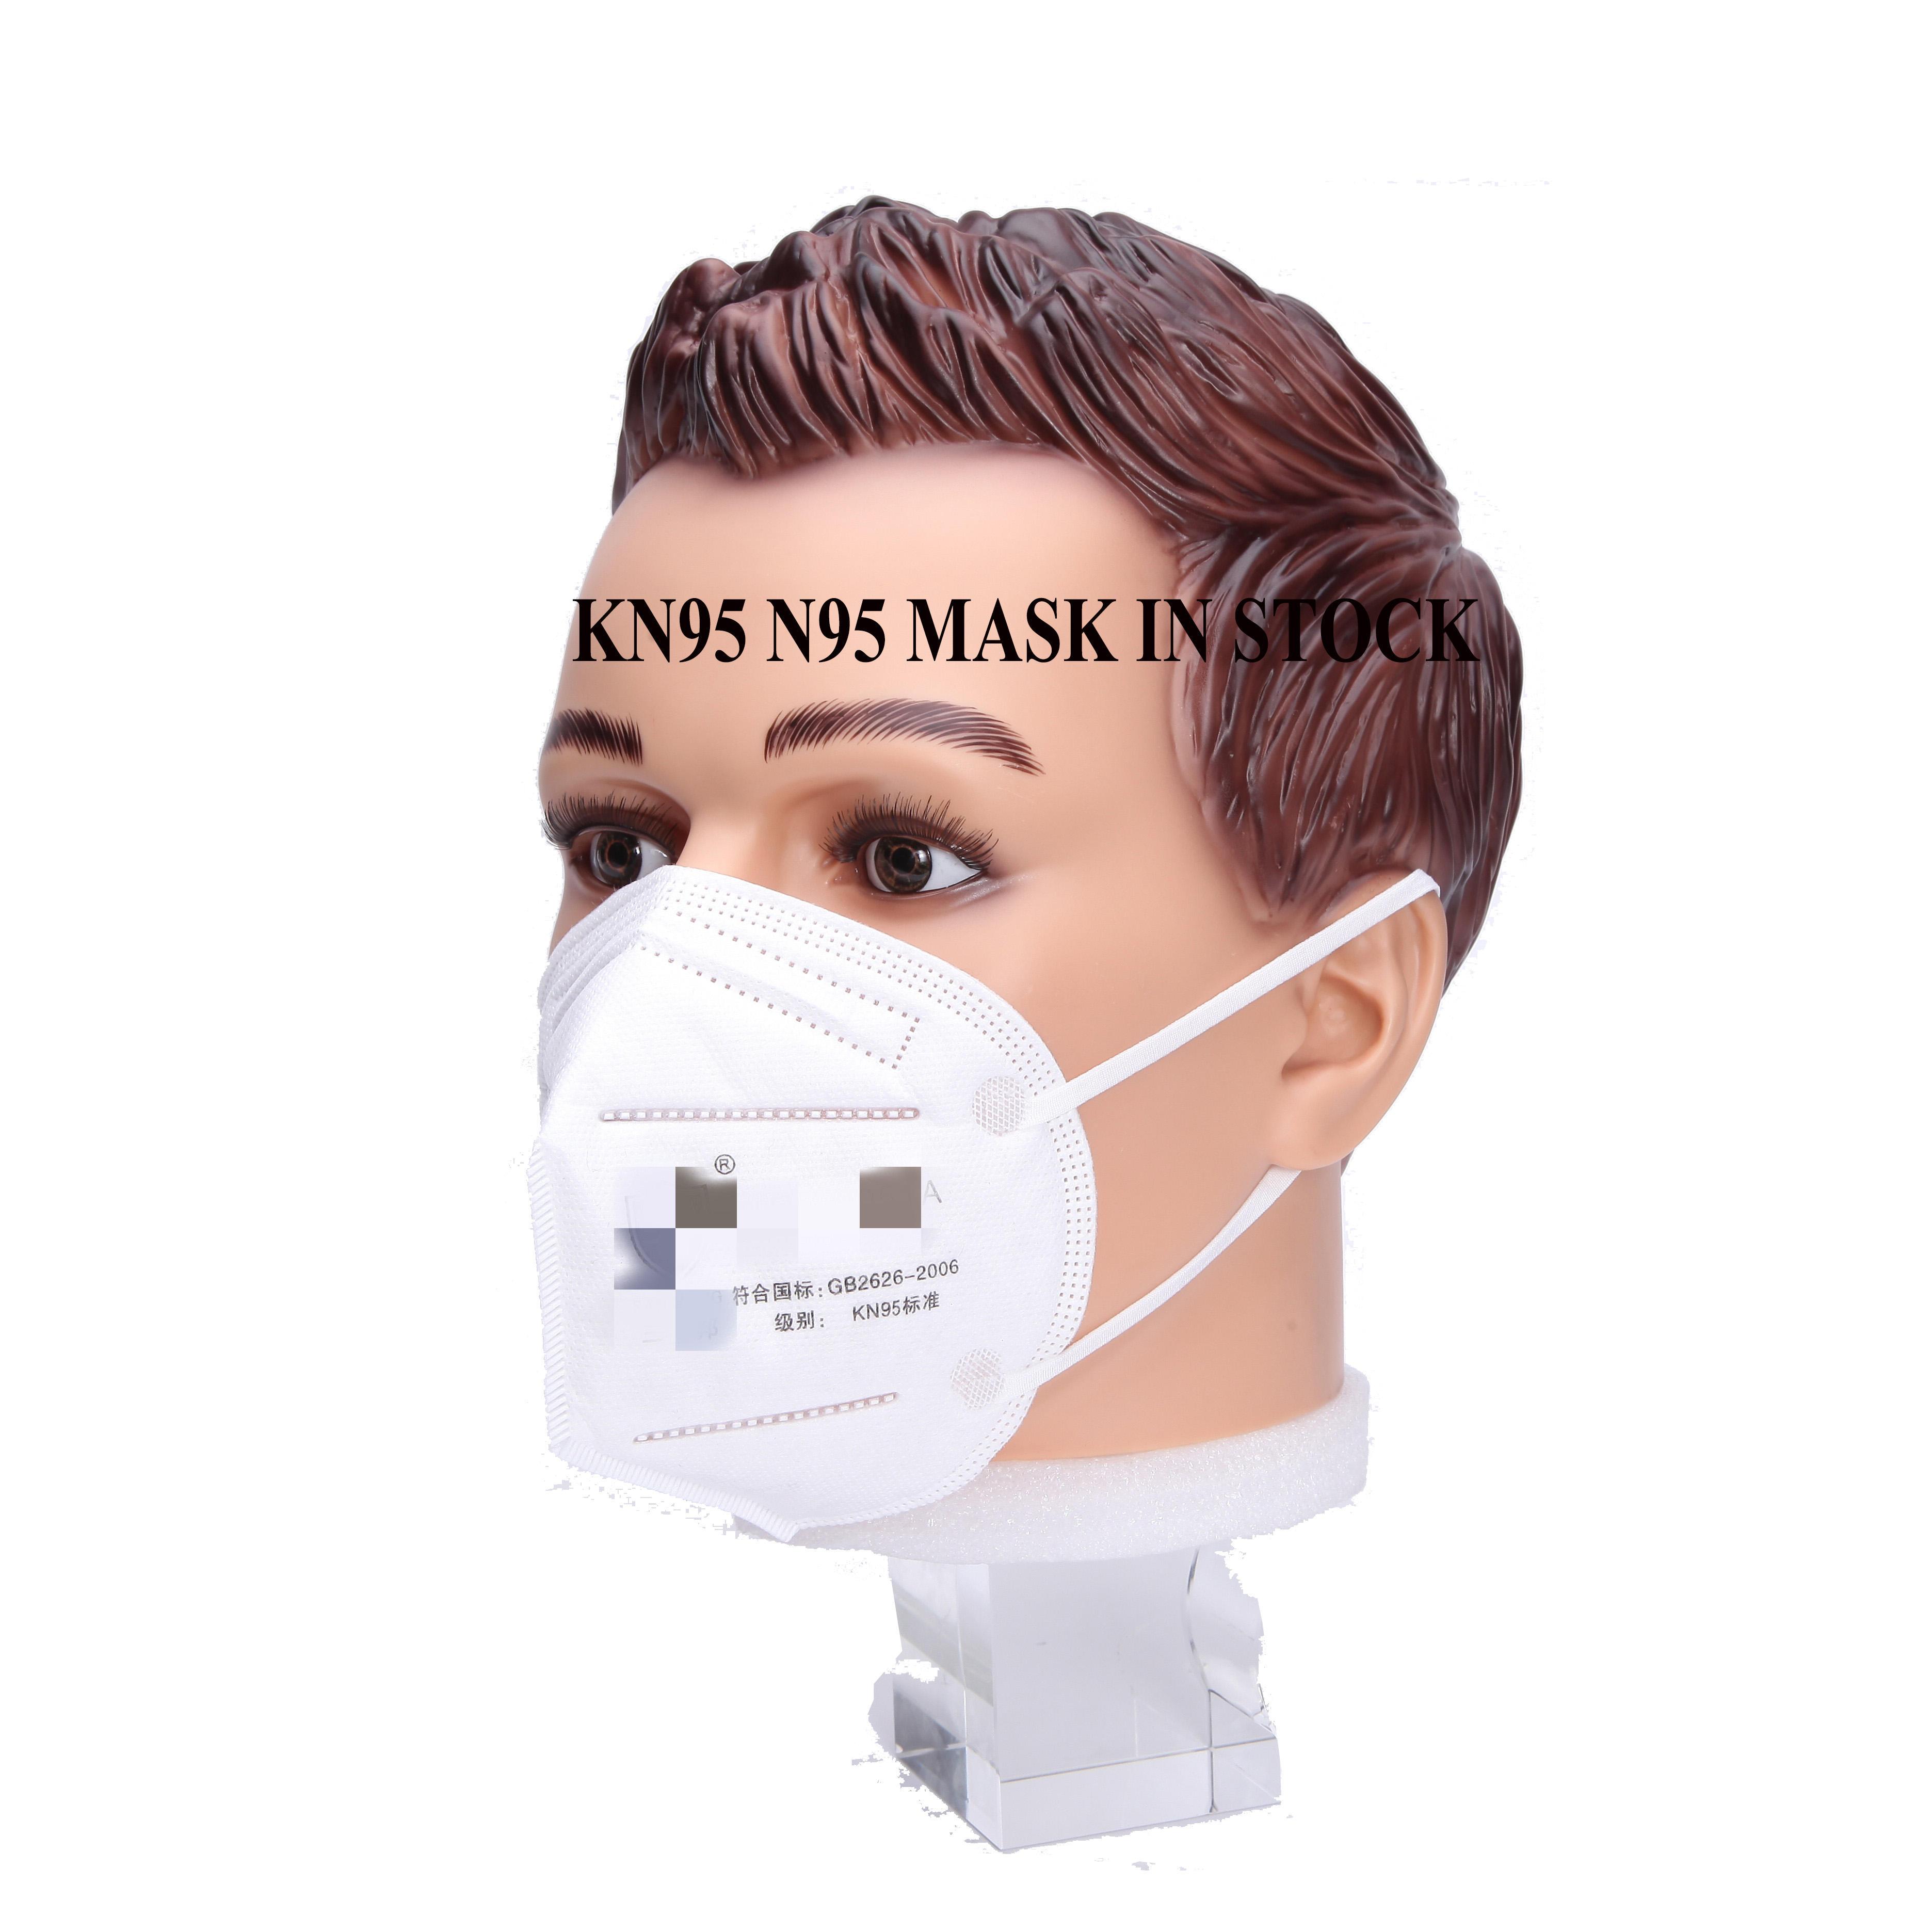 mascherina n95 1860